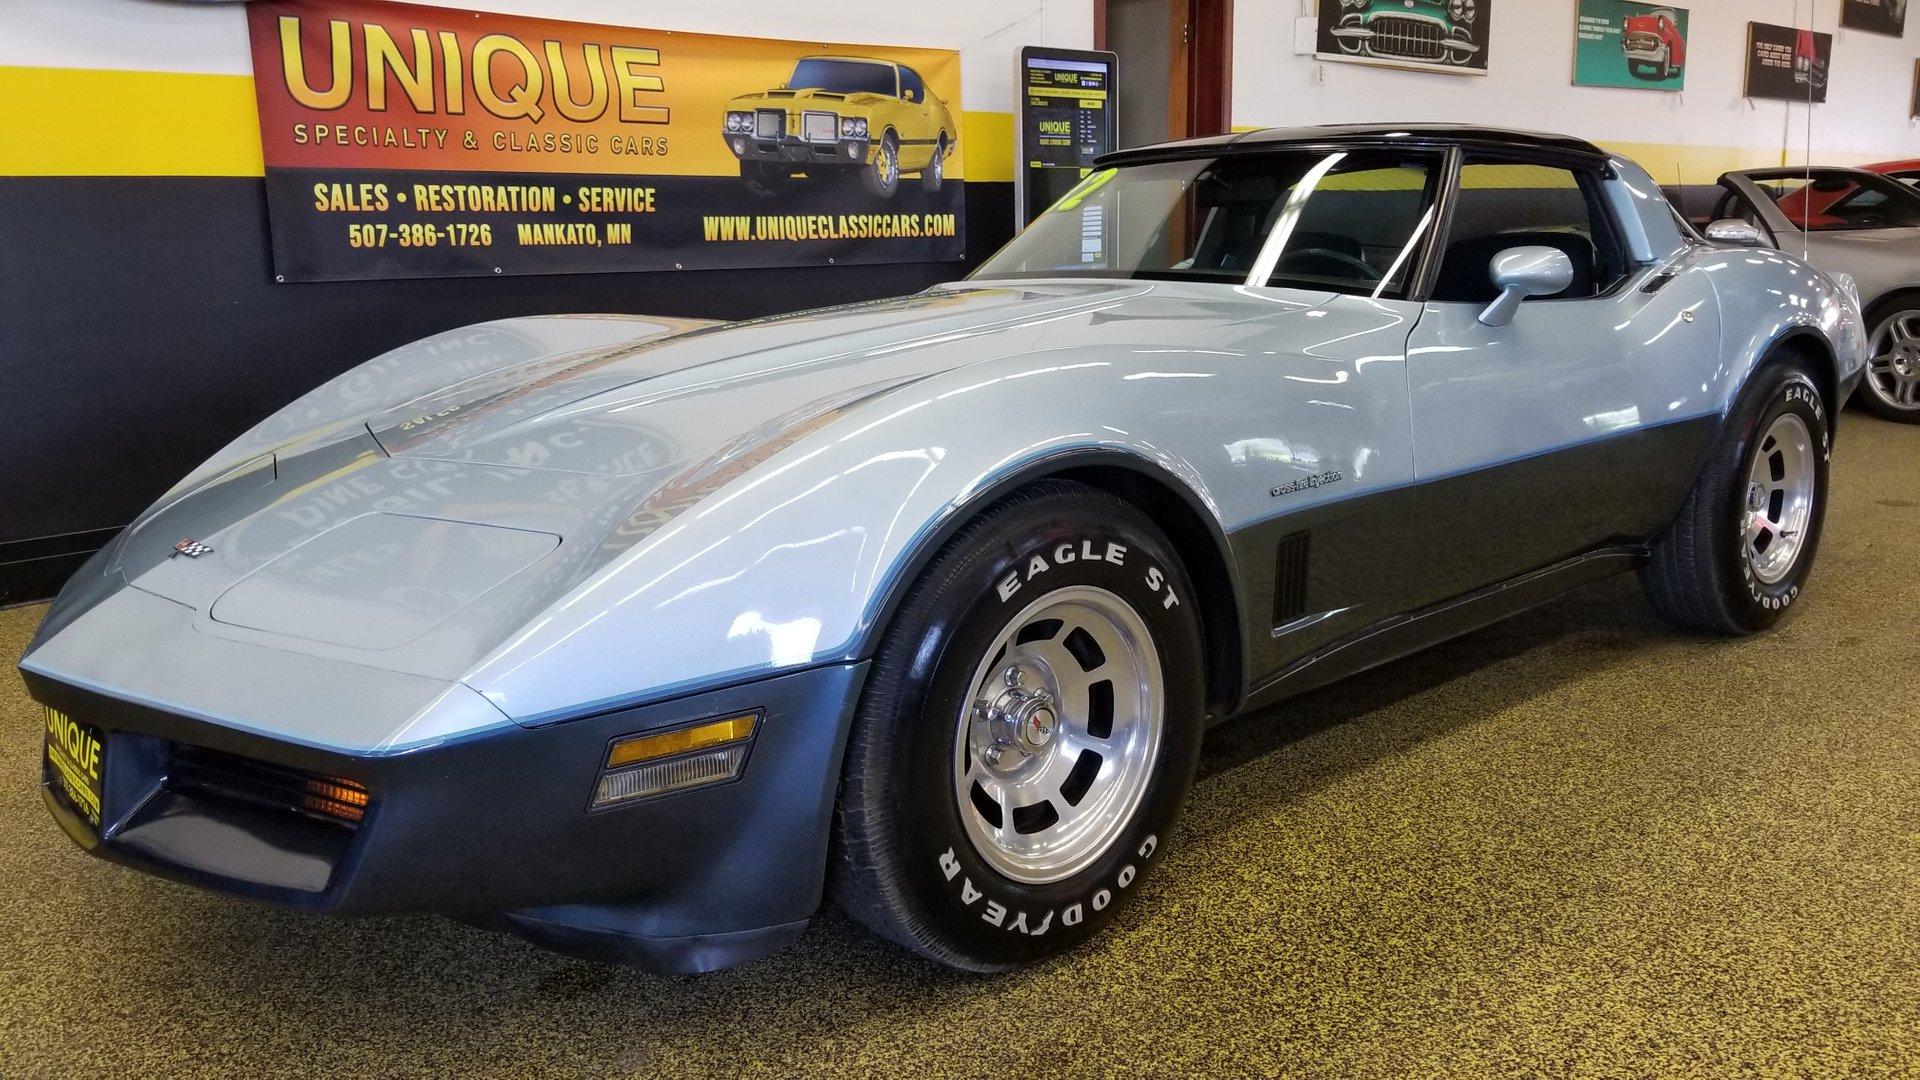 1982 Corvette For Sale >> 1982 Chevrolet Corvette For Sale 167911 Motorious